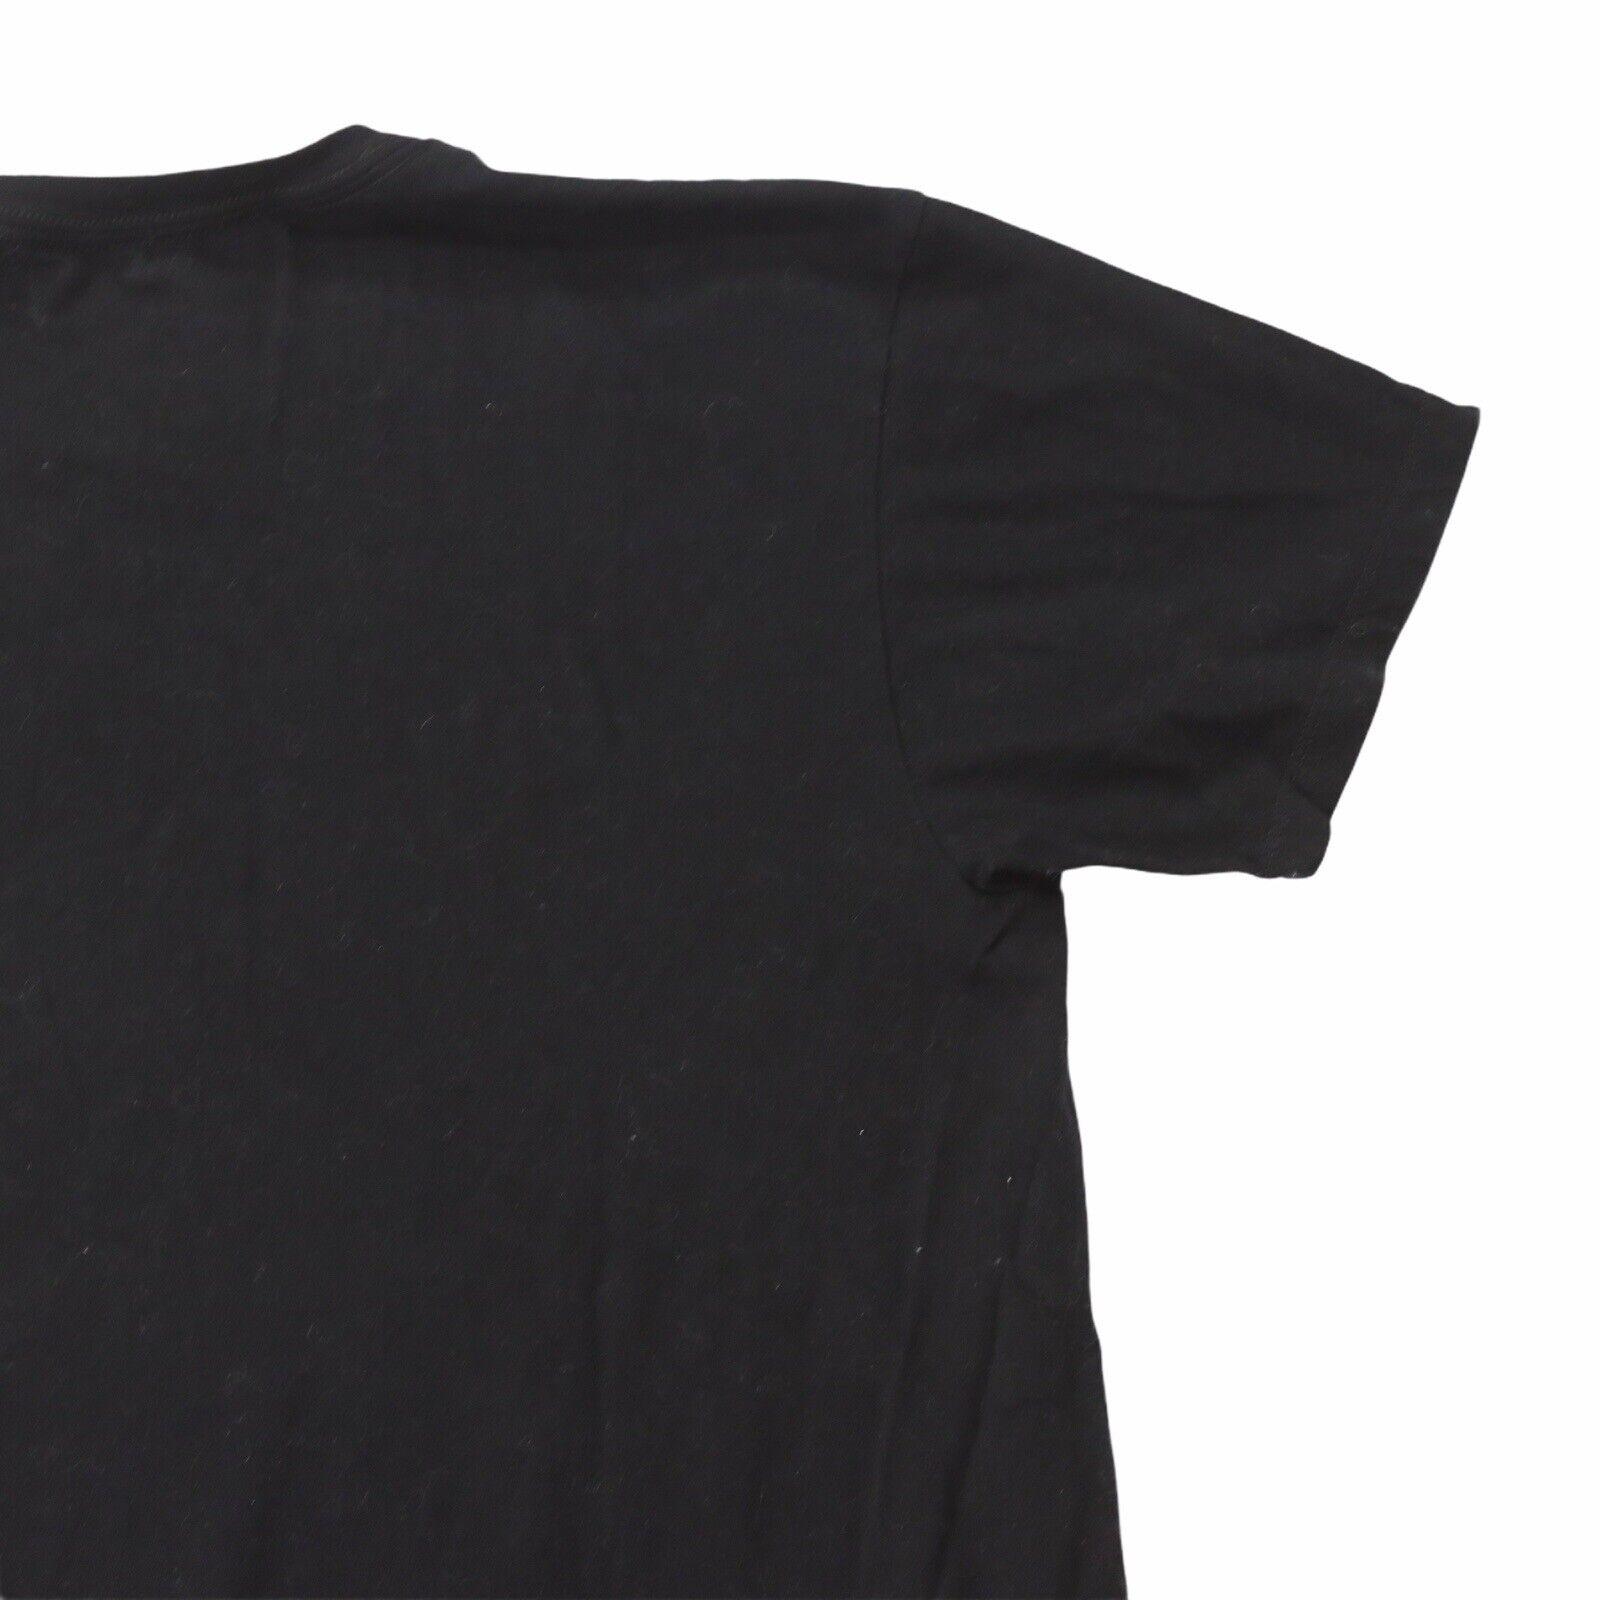 Britney Spears Shirt - It's Britney, Bitch! Rare … - image 8